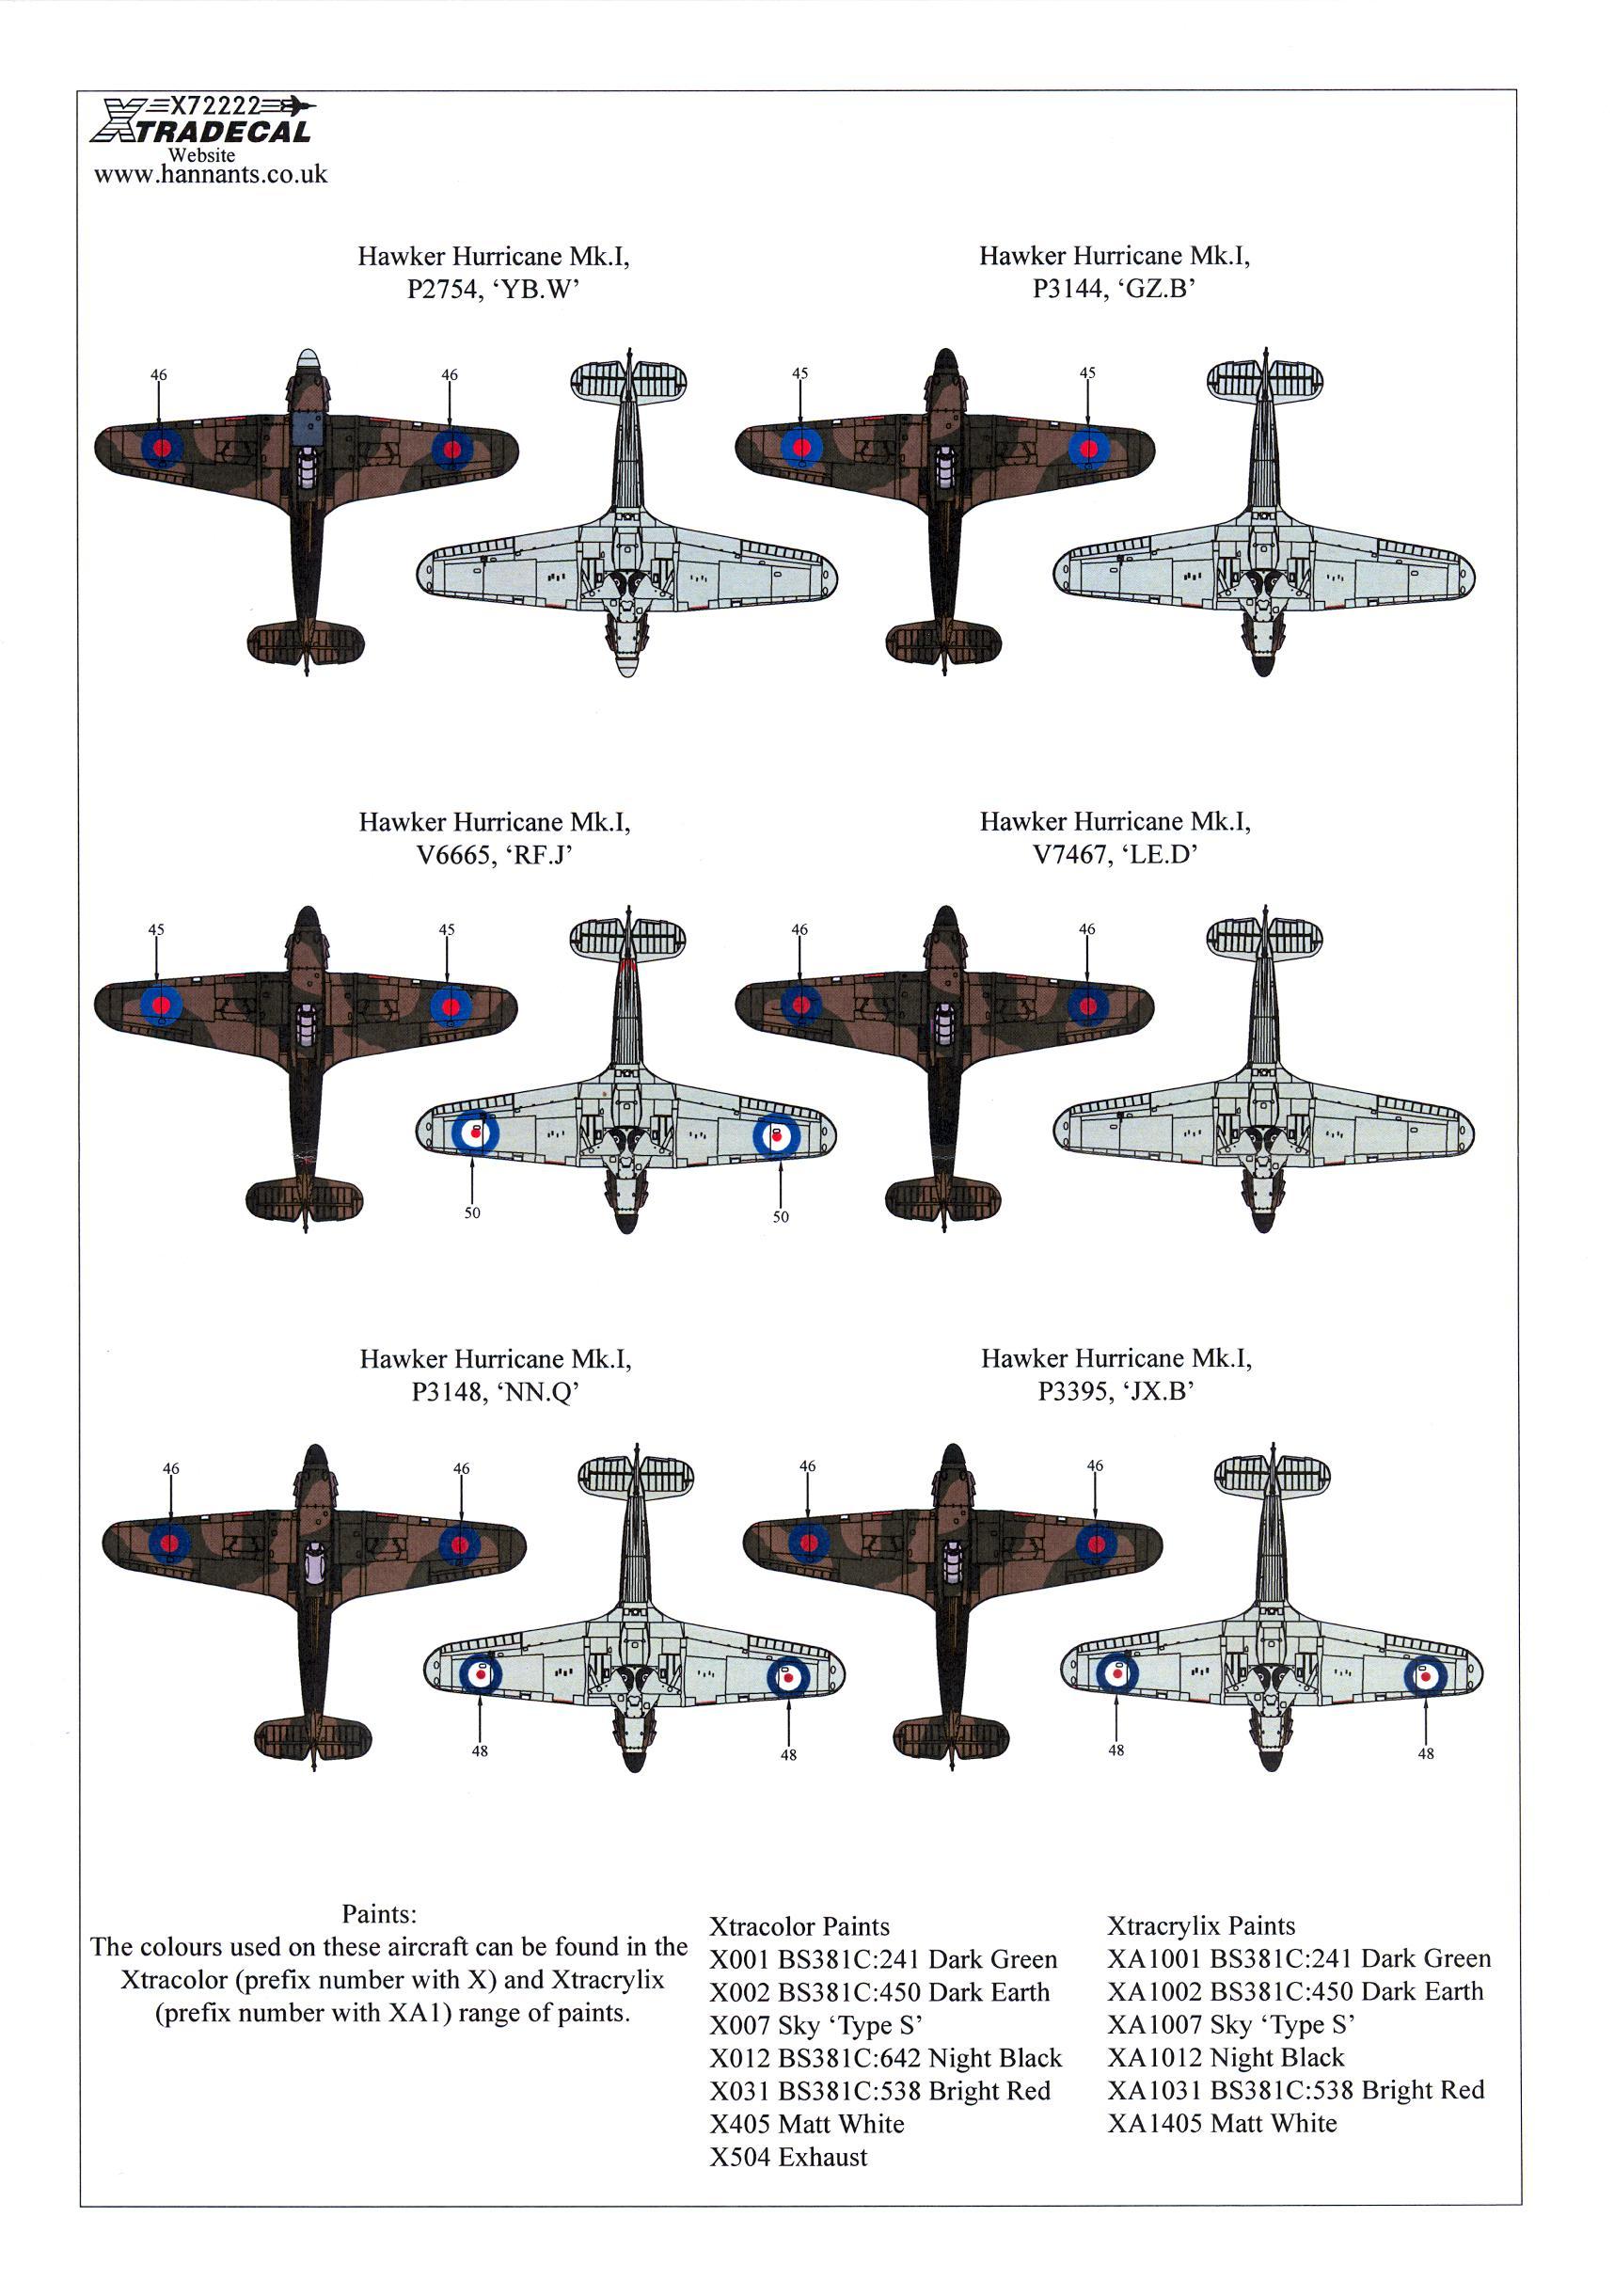 Xtra Decals 1/72 HAWKER HURRICANE Mk.I 75th Anniversary